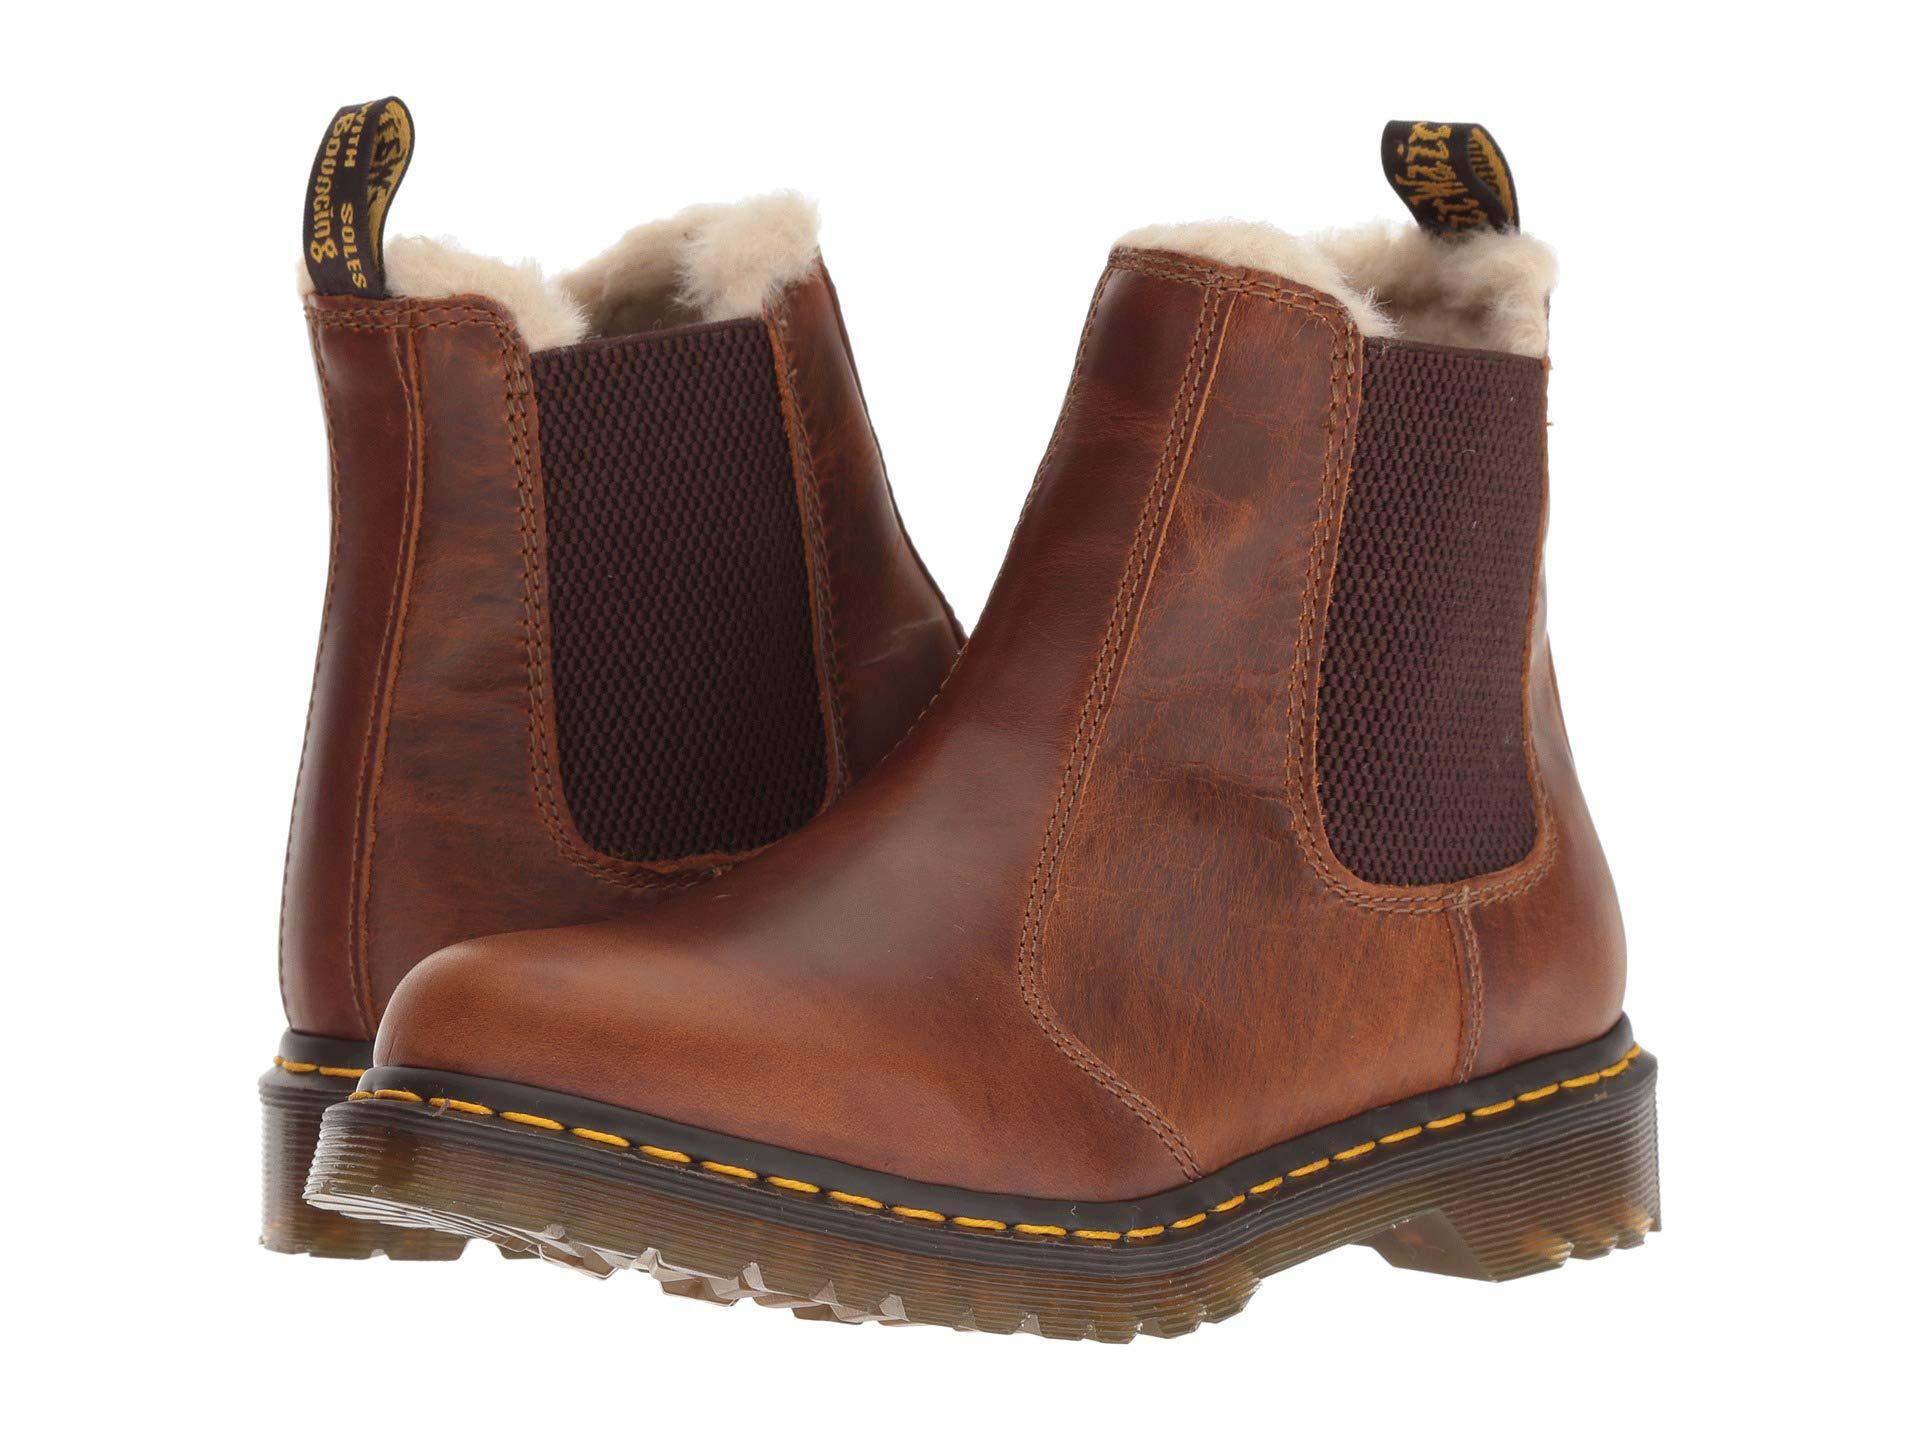 Dr Martens 1460 Serena 8 Eye Boot Butterscotch Orleans Winterstiefel Boots